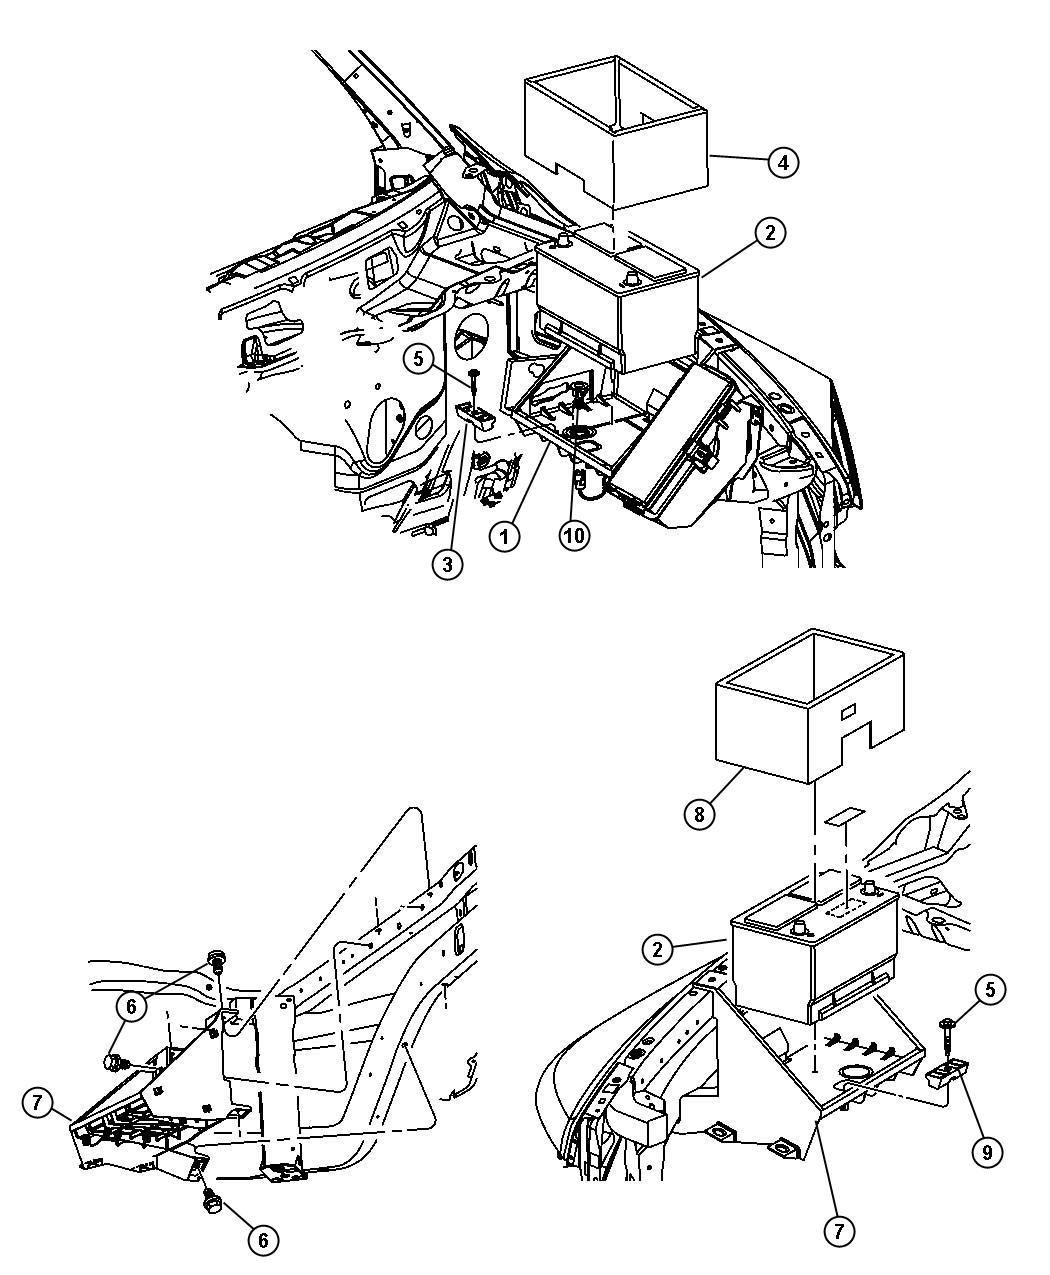 Dodge Ram 2500 Tray. Battery. Wiring, engine, engines